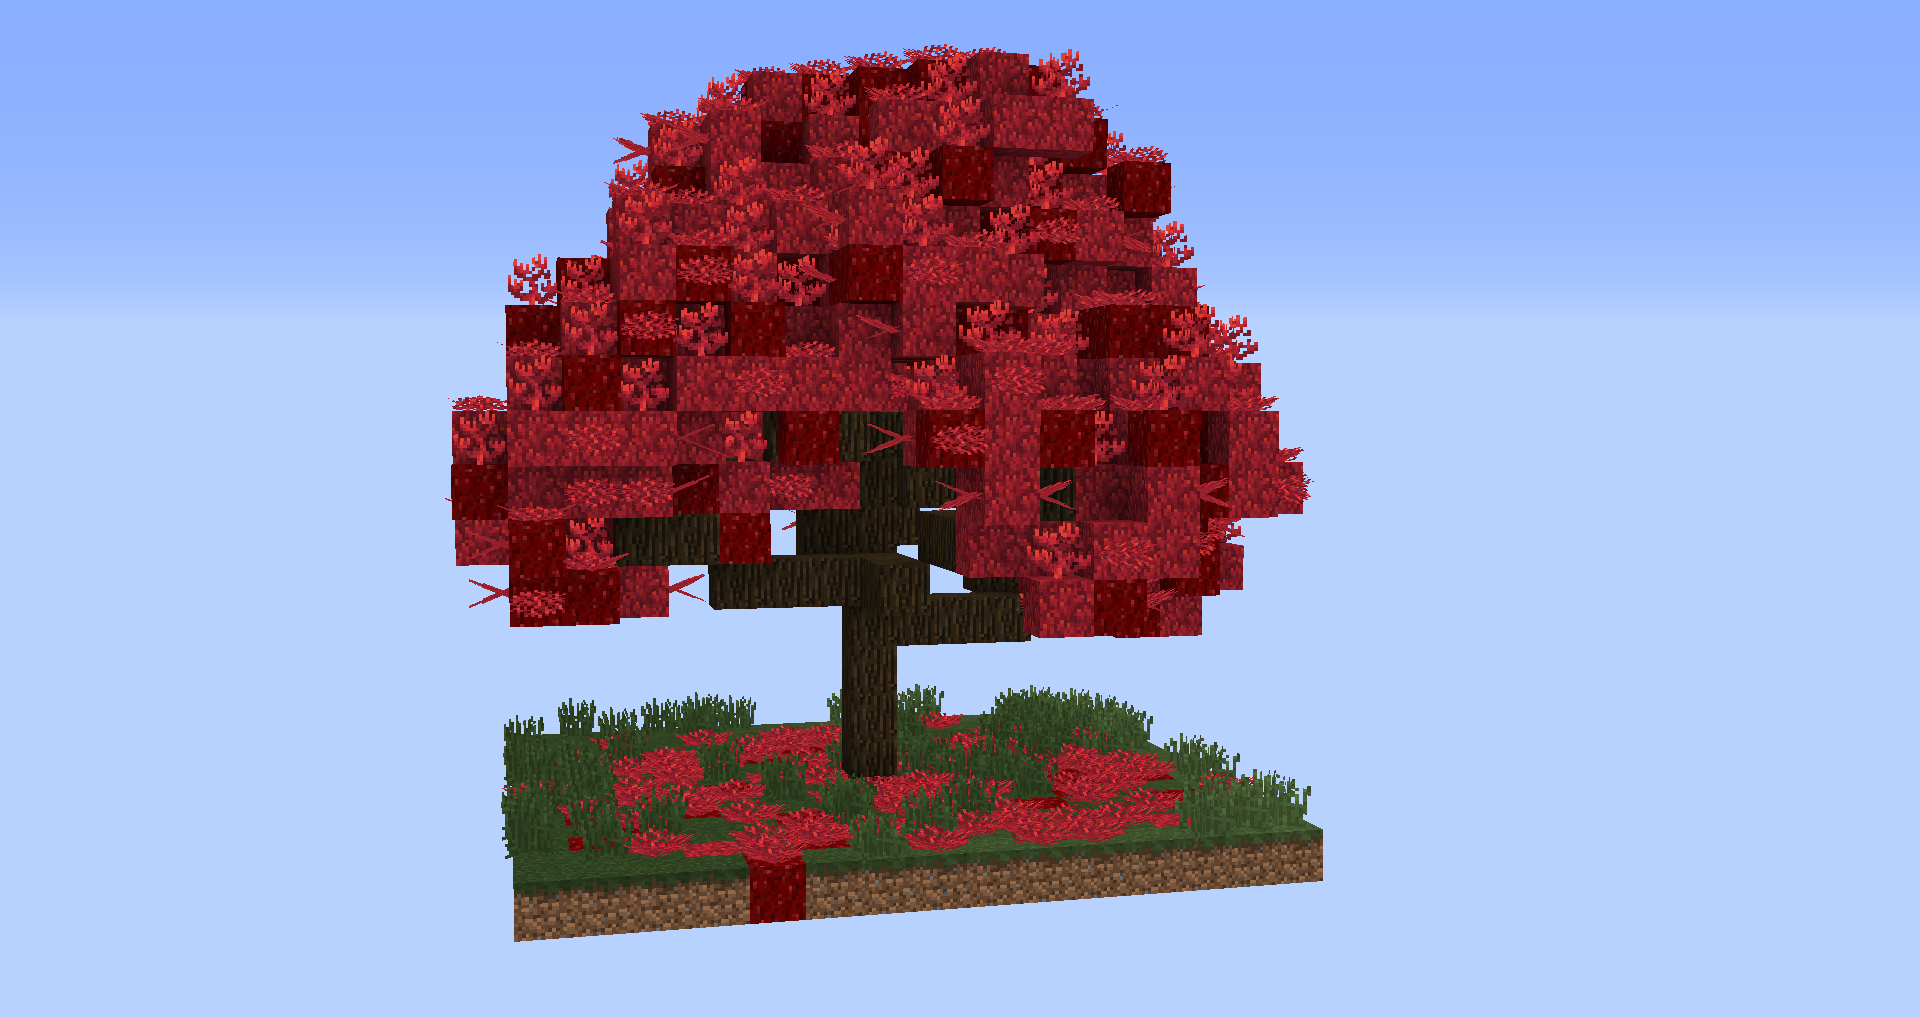 Giant Tree Minecraft Project Minecraft Tree Minecraft Treehouses Minecraft Blueprints